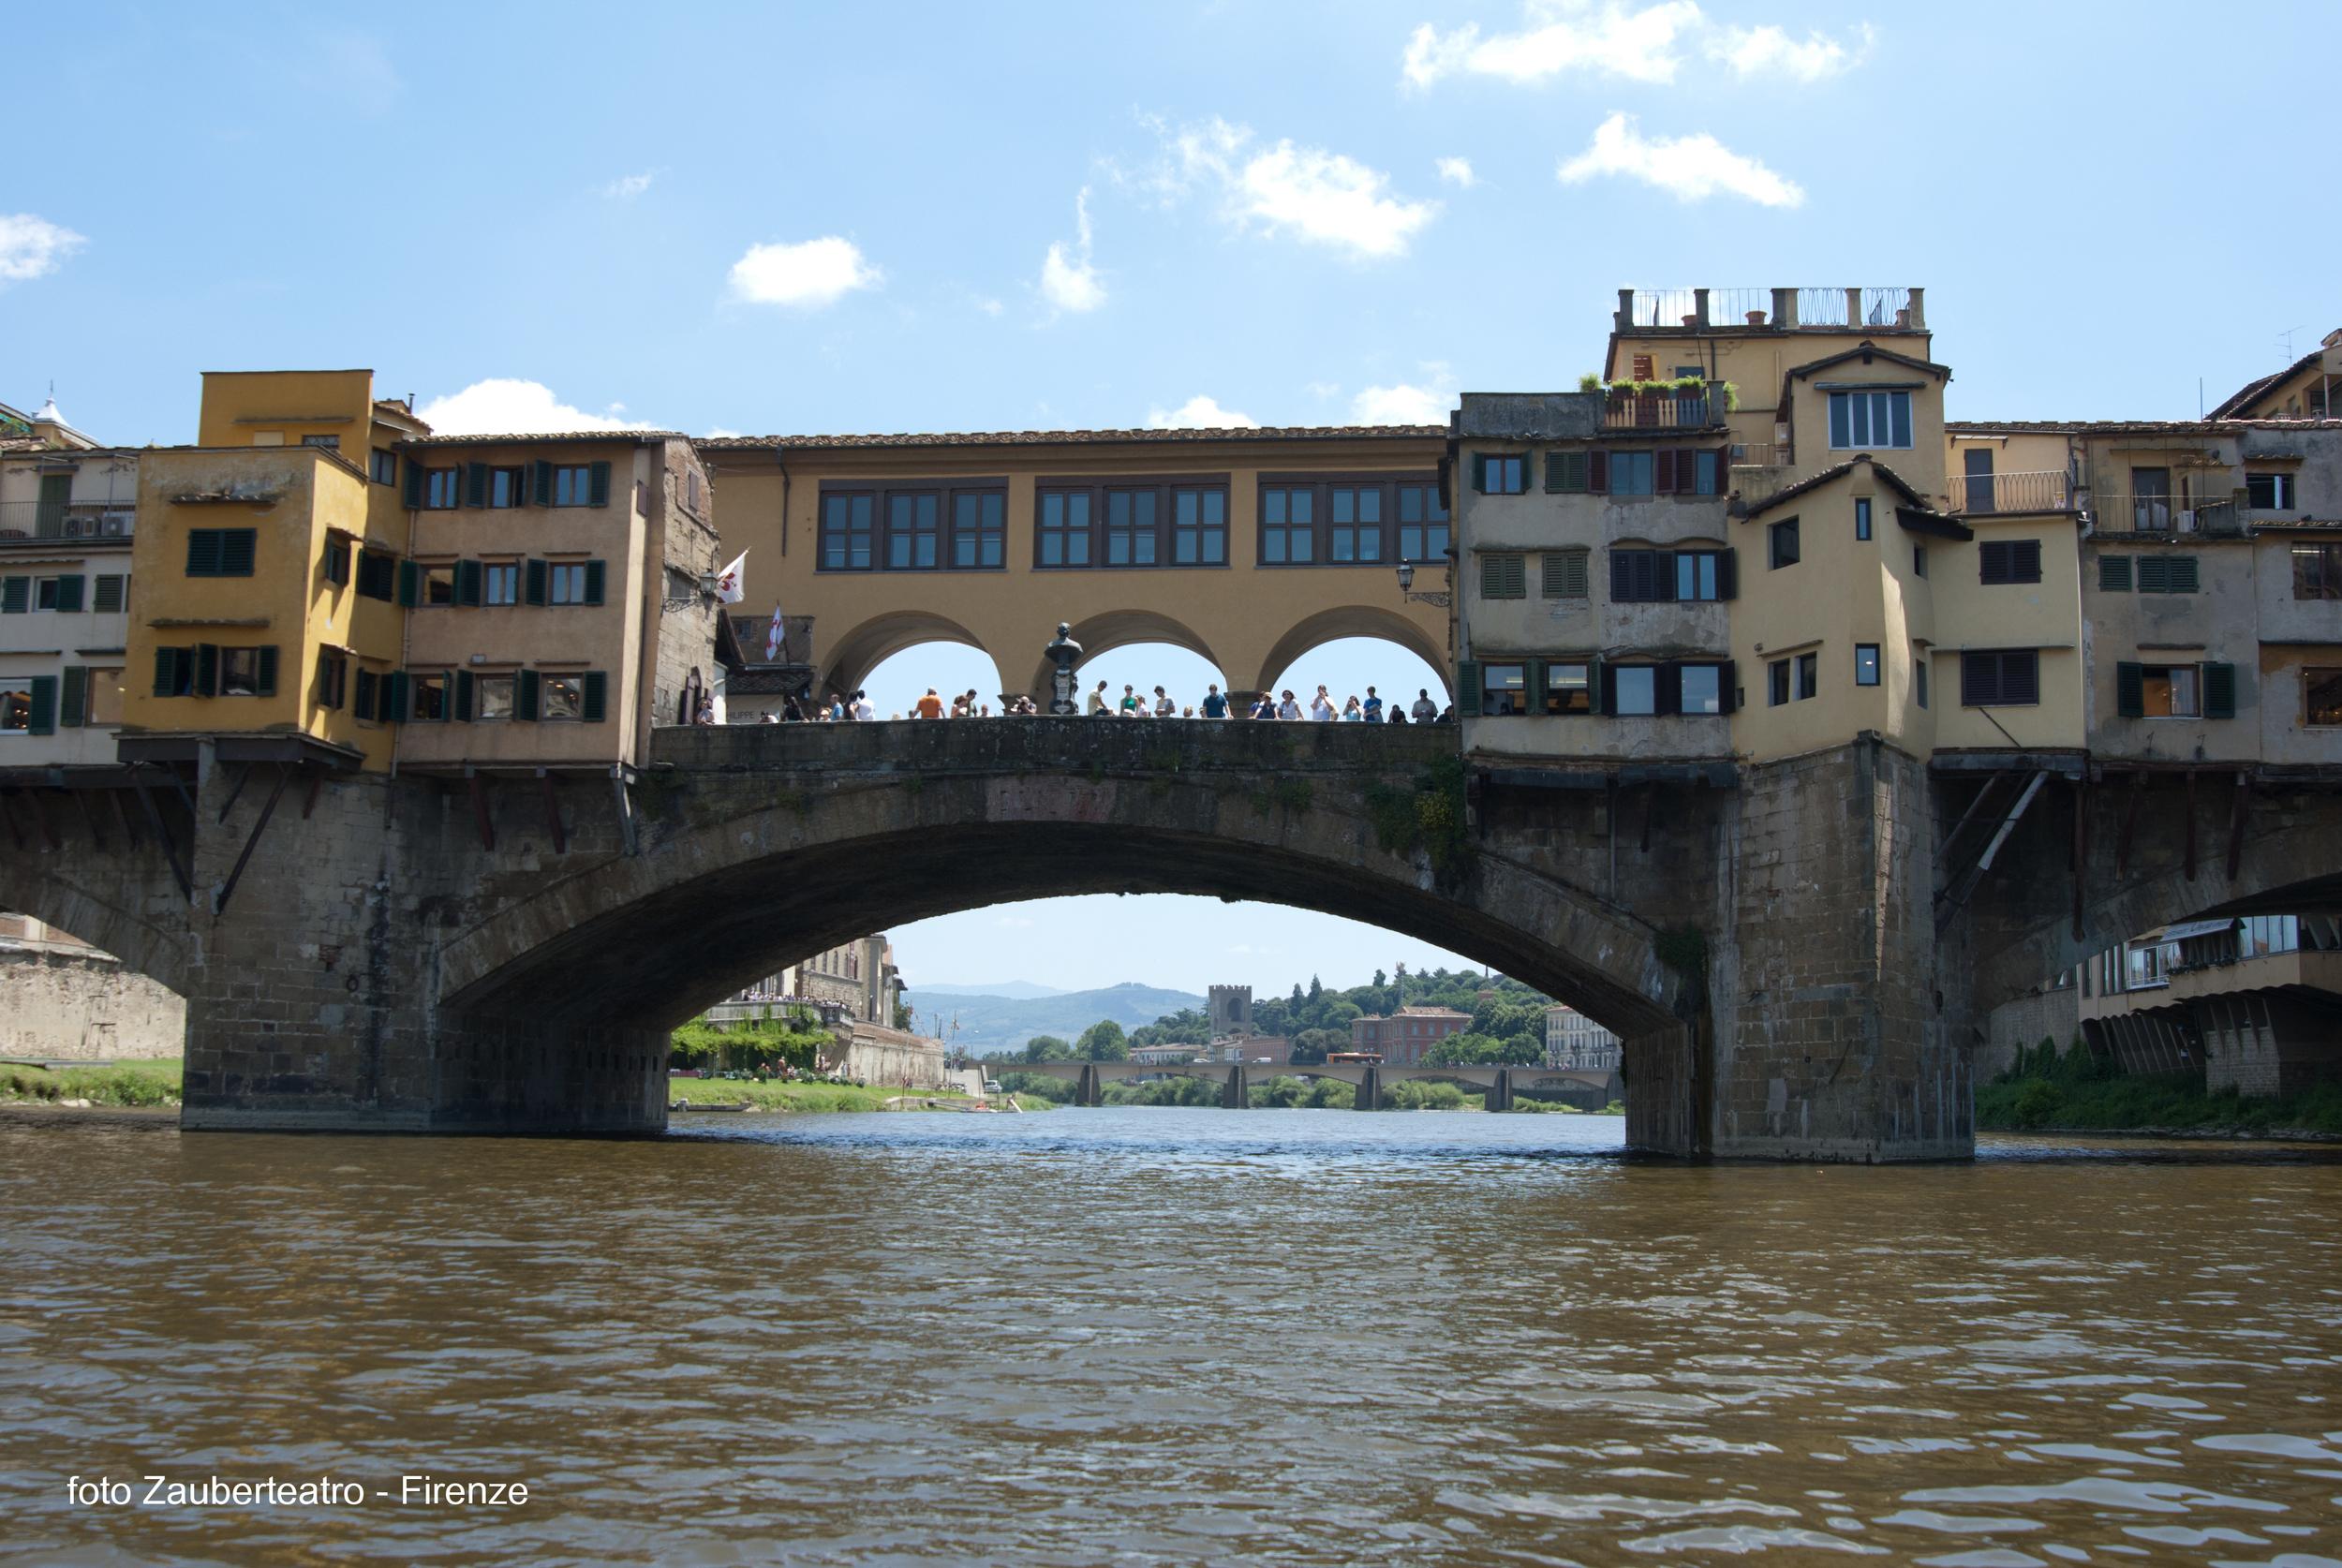 [Zauber][Arno]_ponte01.jpg